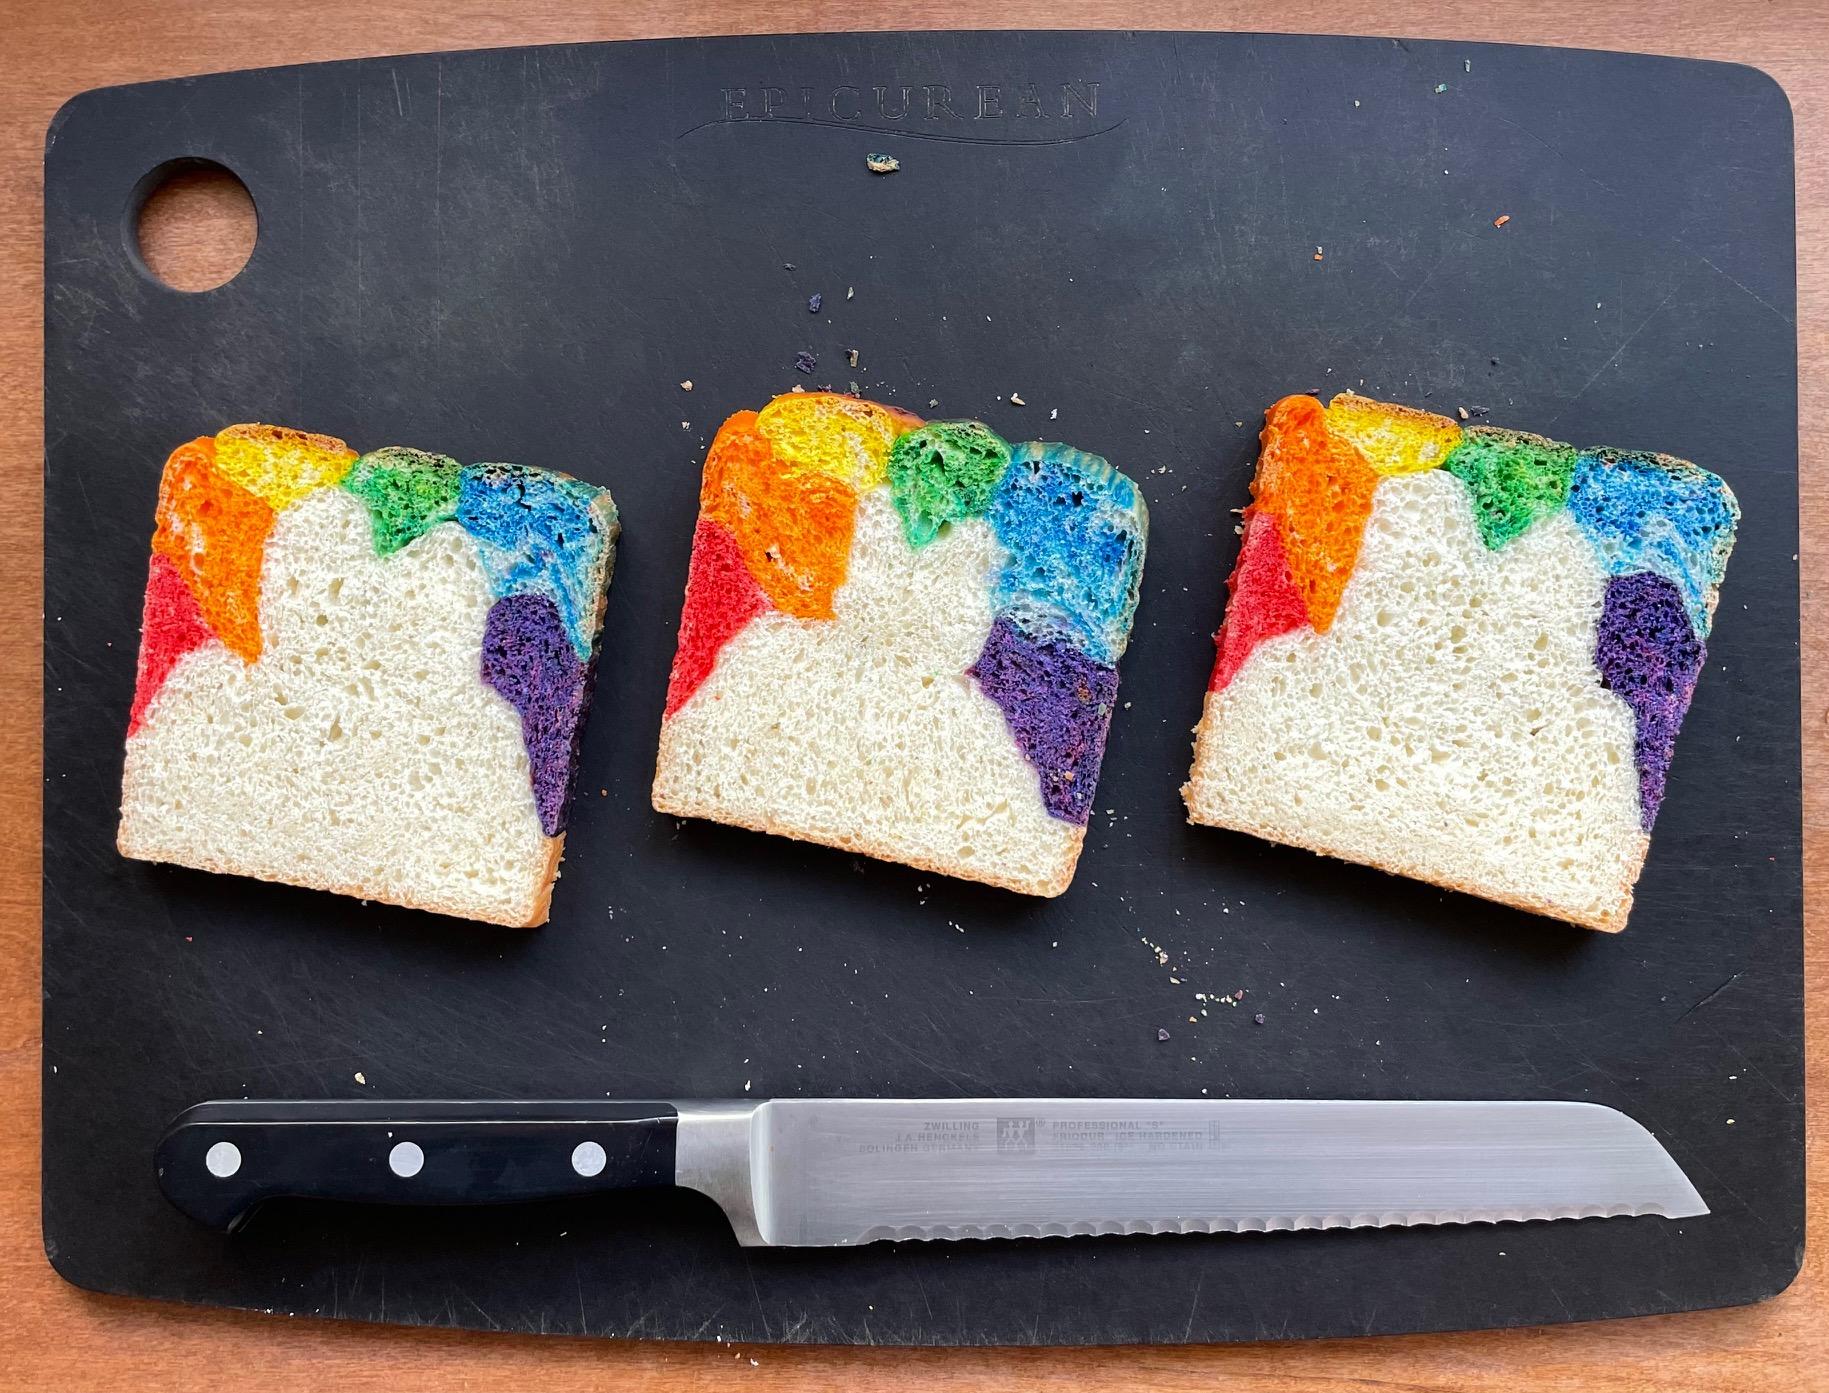 A rainbow bread recipe for Japanese milk bread